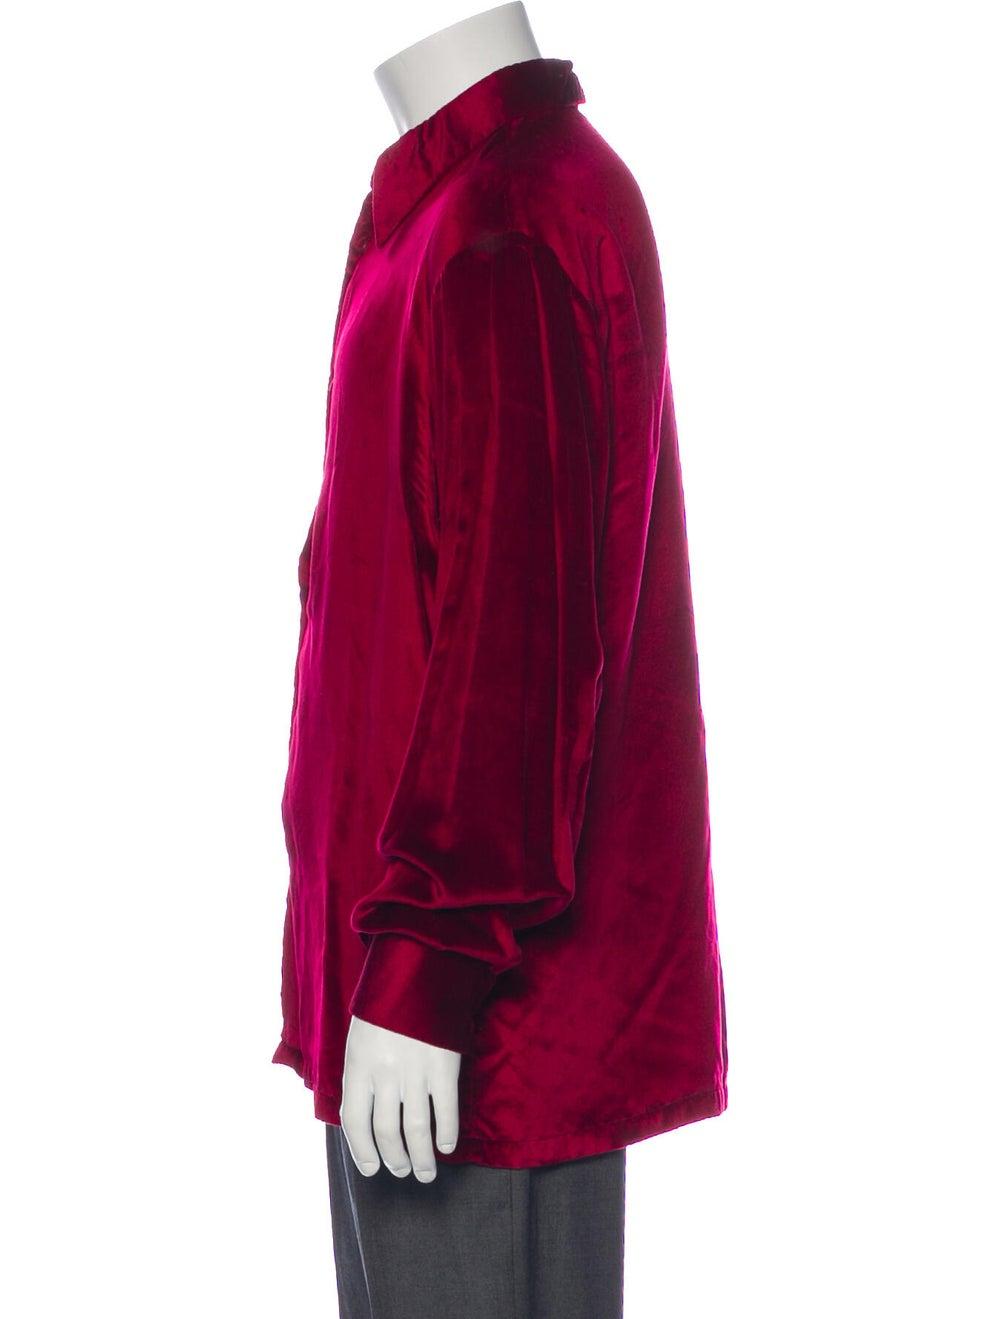 Gucci Vintage 1990's Dress Shirt Red - image 2